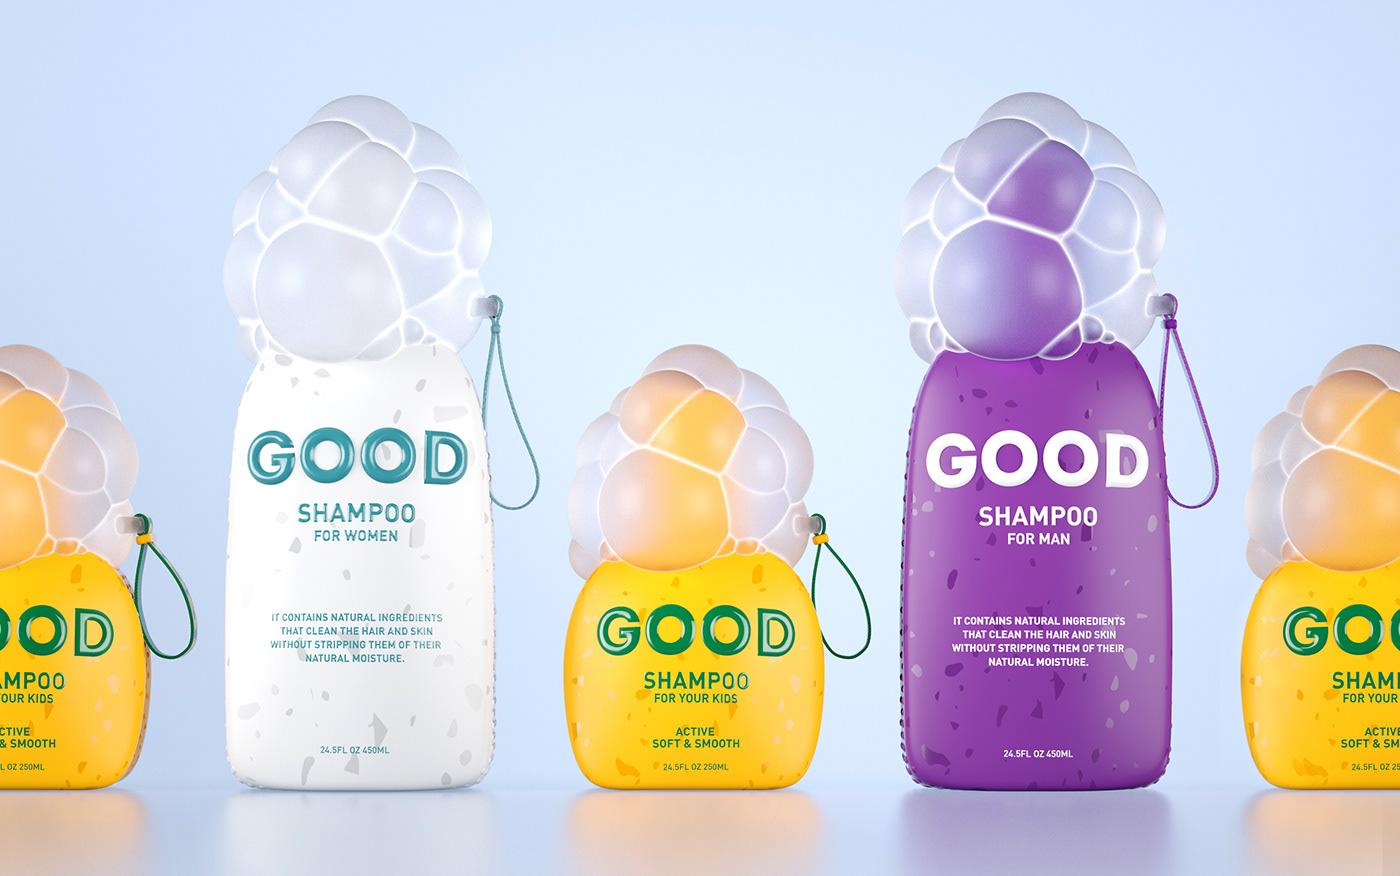 bath bolimond bubbles cosmetics direct associations Foam Good Packaging shampoo